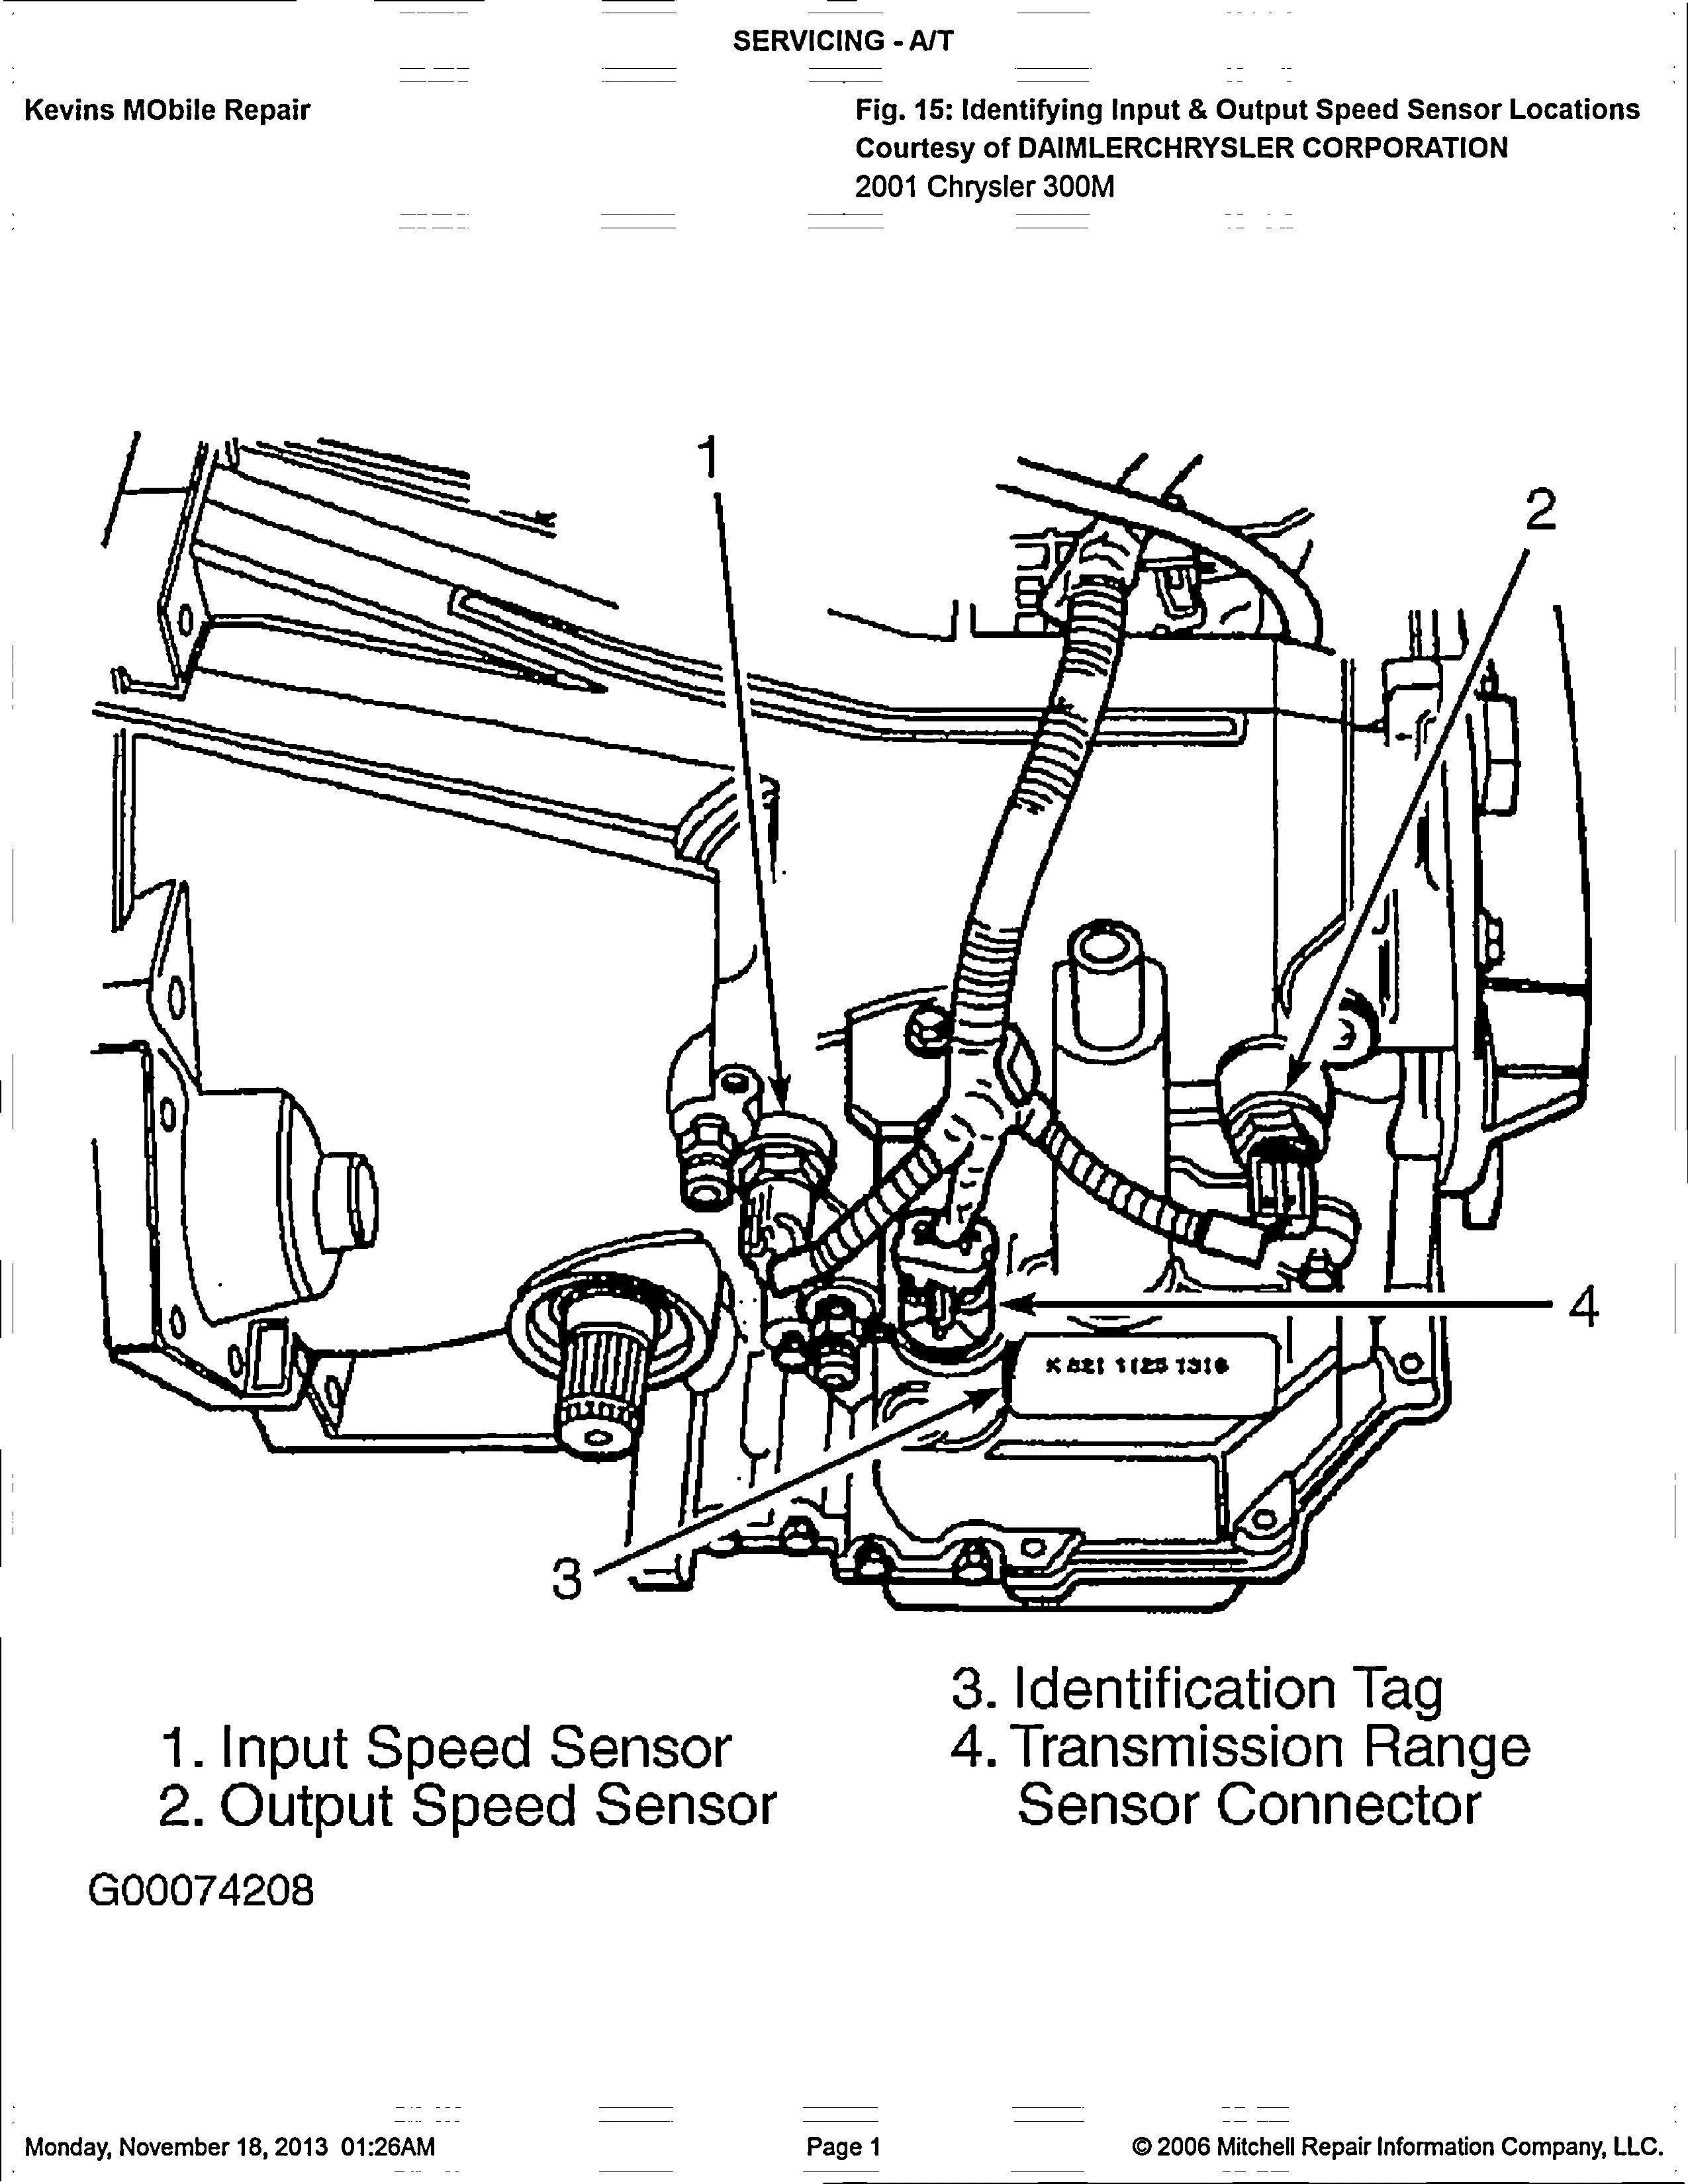 Chrysler 300 2 7 Engine Diagram Nocksenseur Wiring Diagrams Data Seek Origin Seek Origin Ungiaggioloincucina It